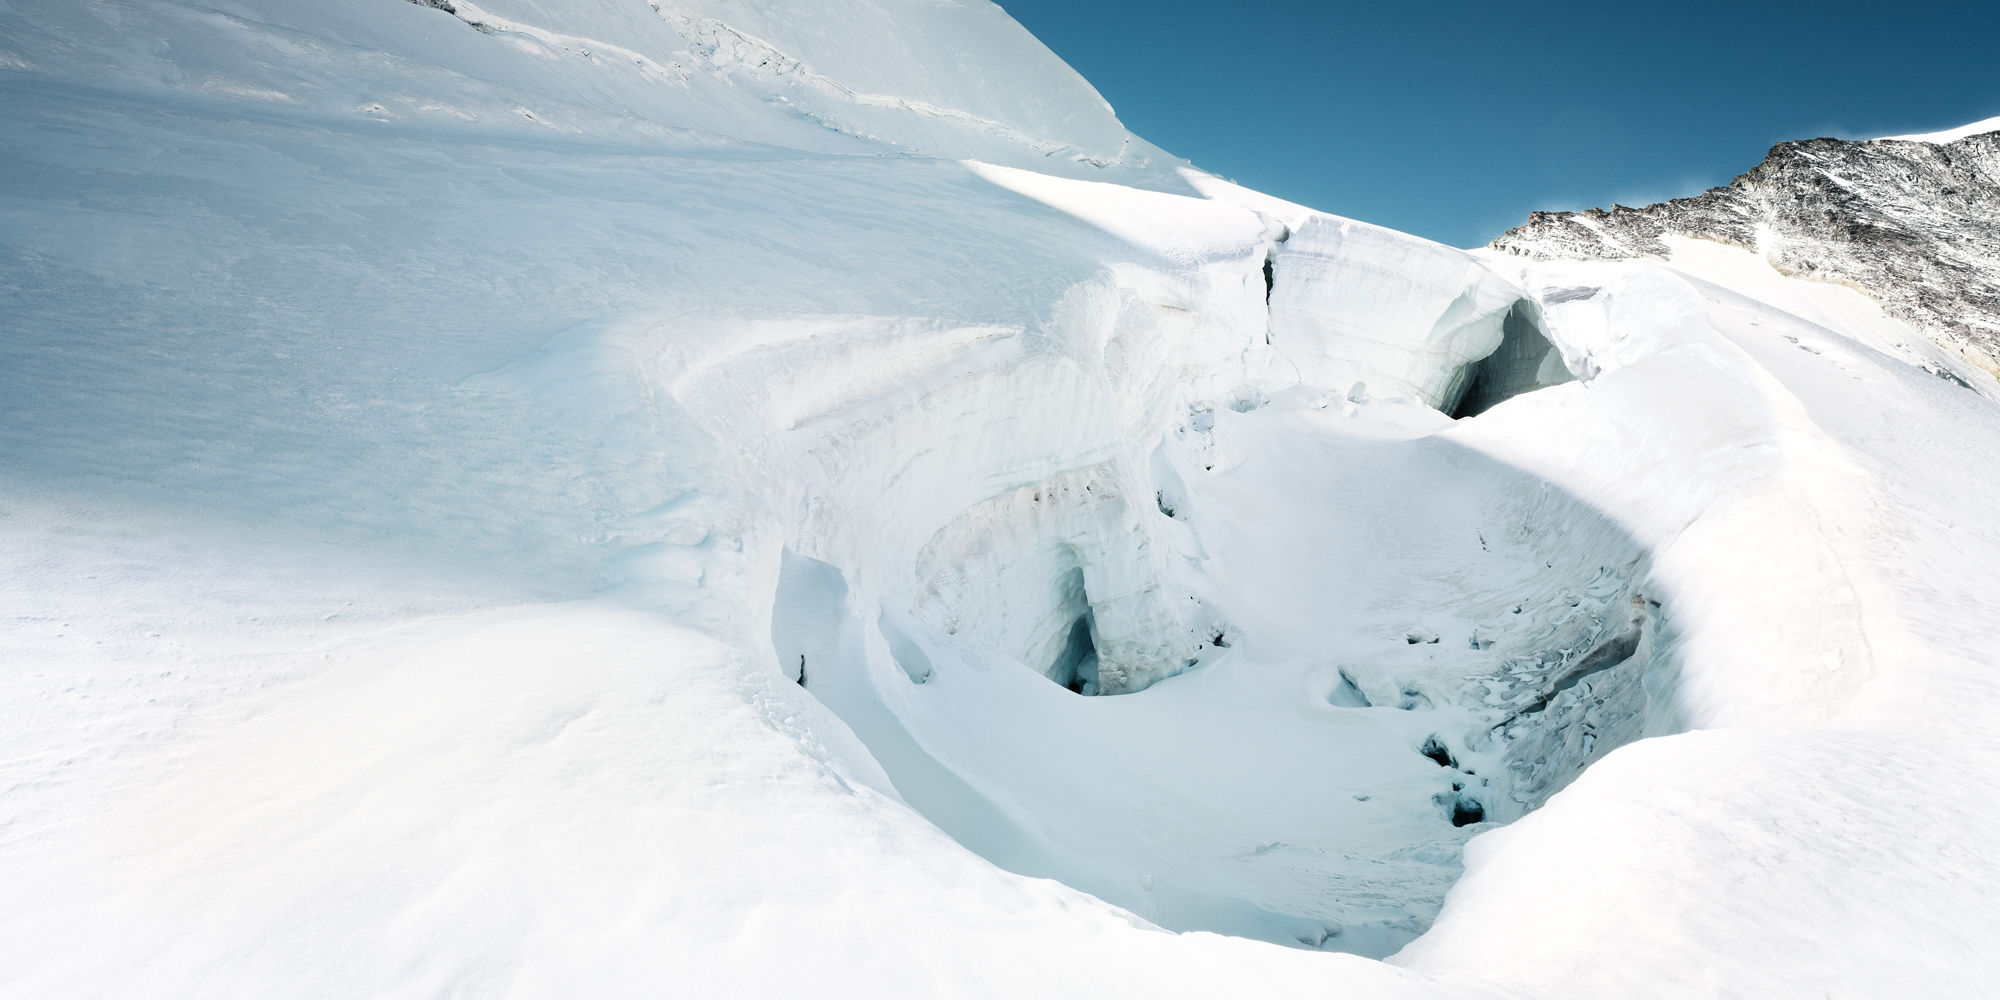 Gletscherspalte Saas-Fee - Freie Ferienrepublik Saas-Fee